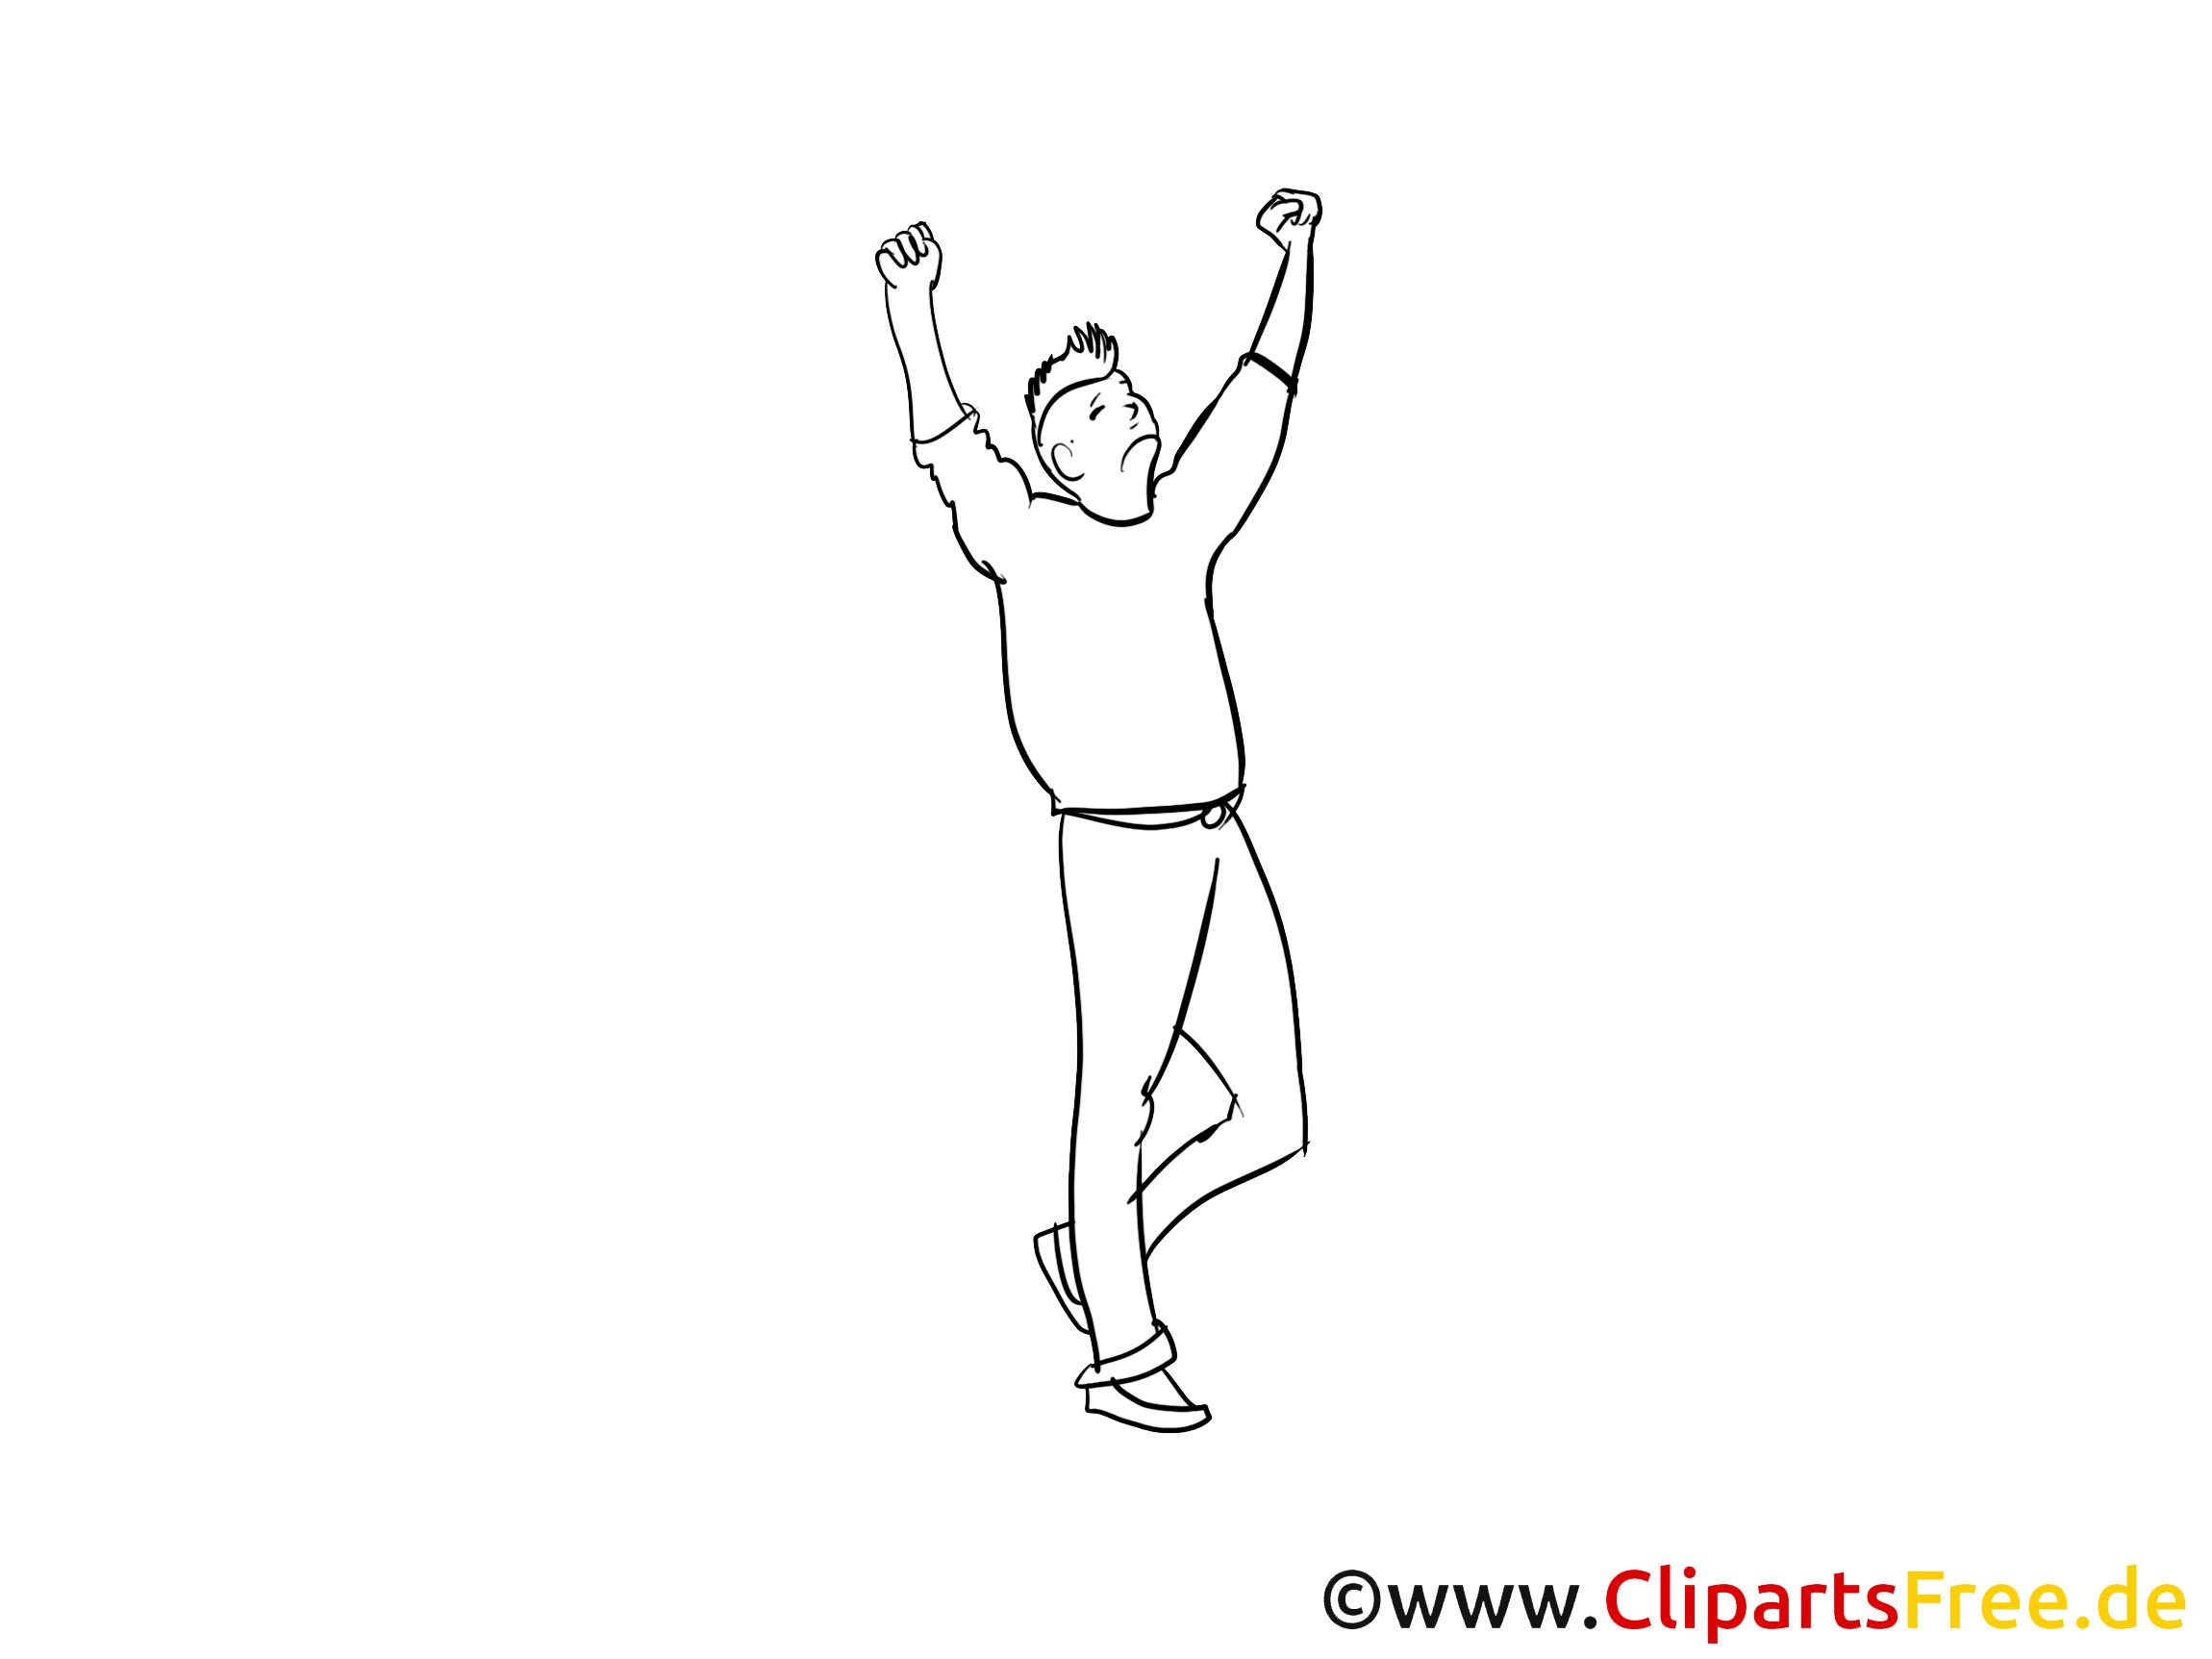 Mann jubelt Clipart, Bild, Cartoon